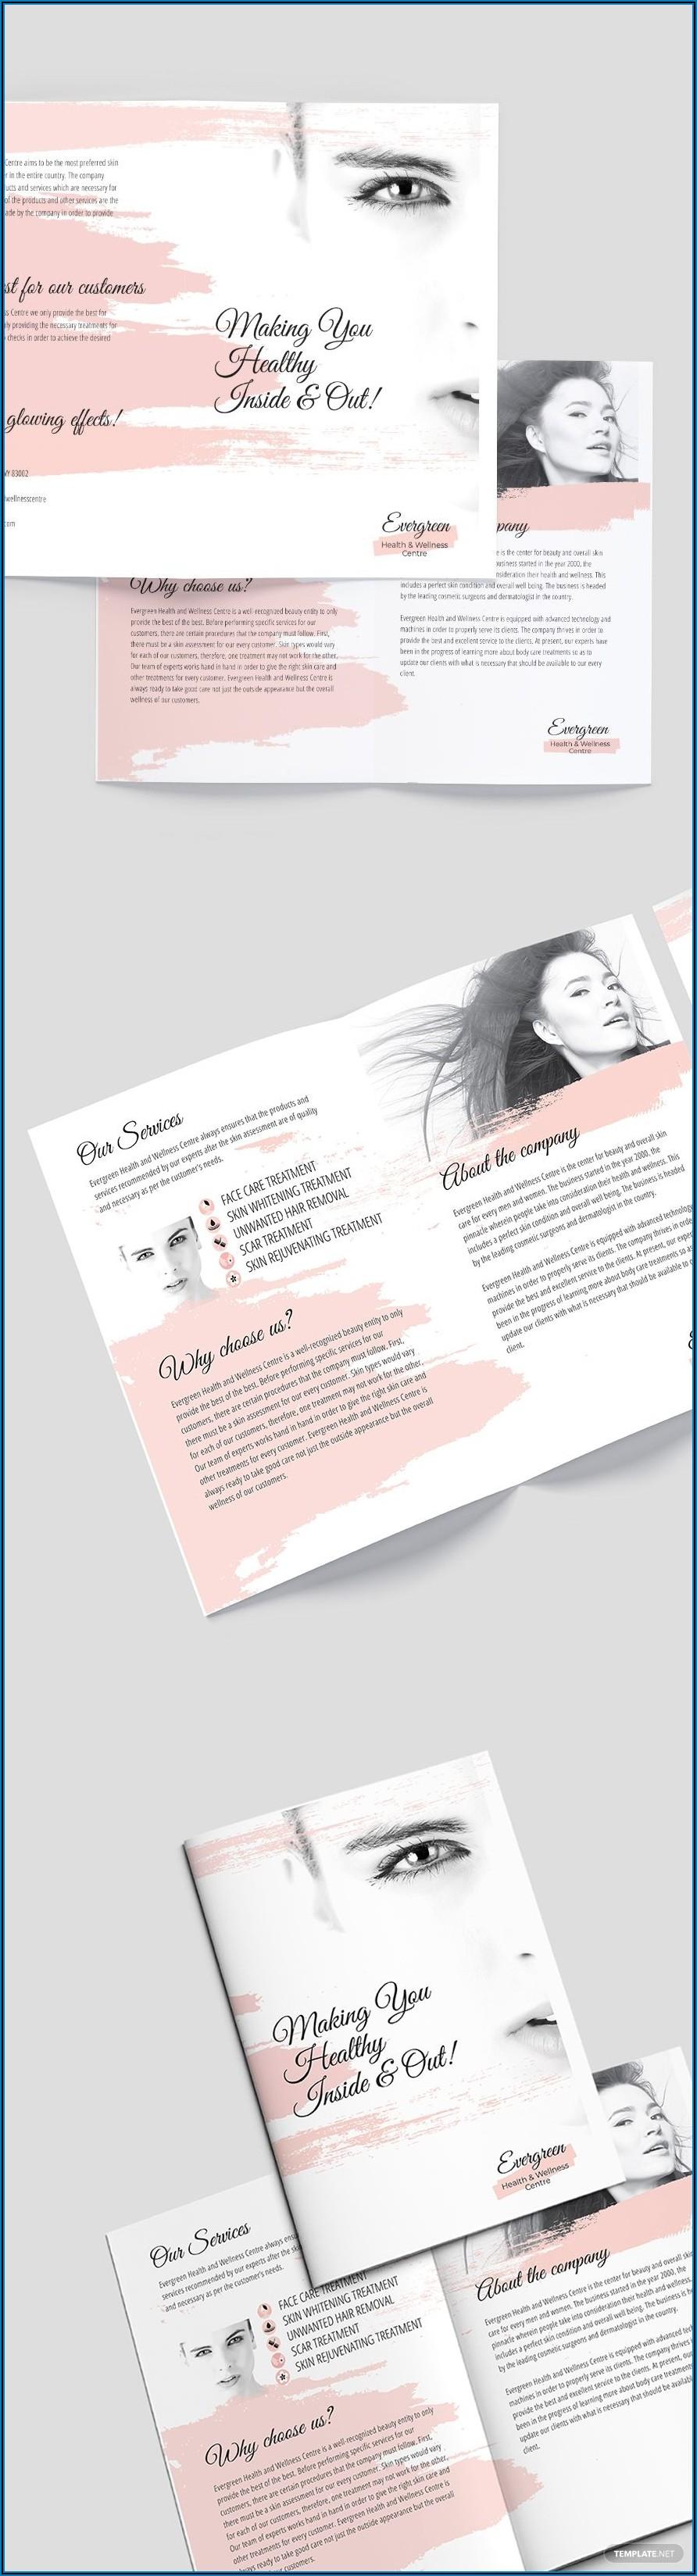 Accordion Fold Brochure Template Word